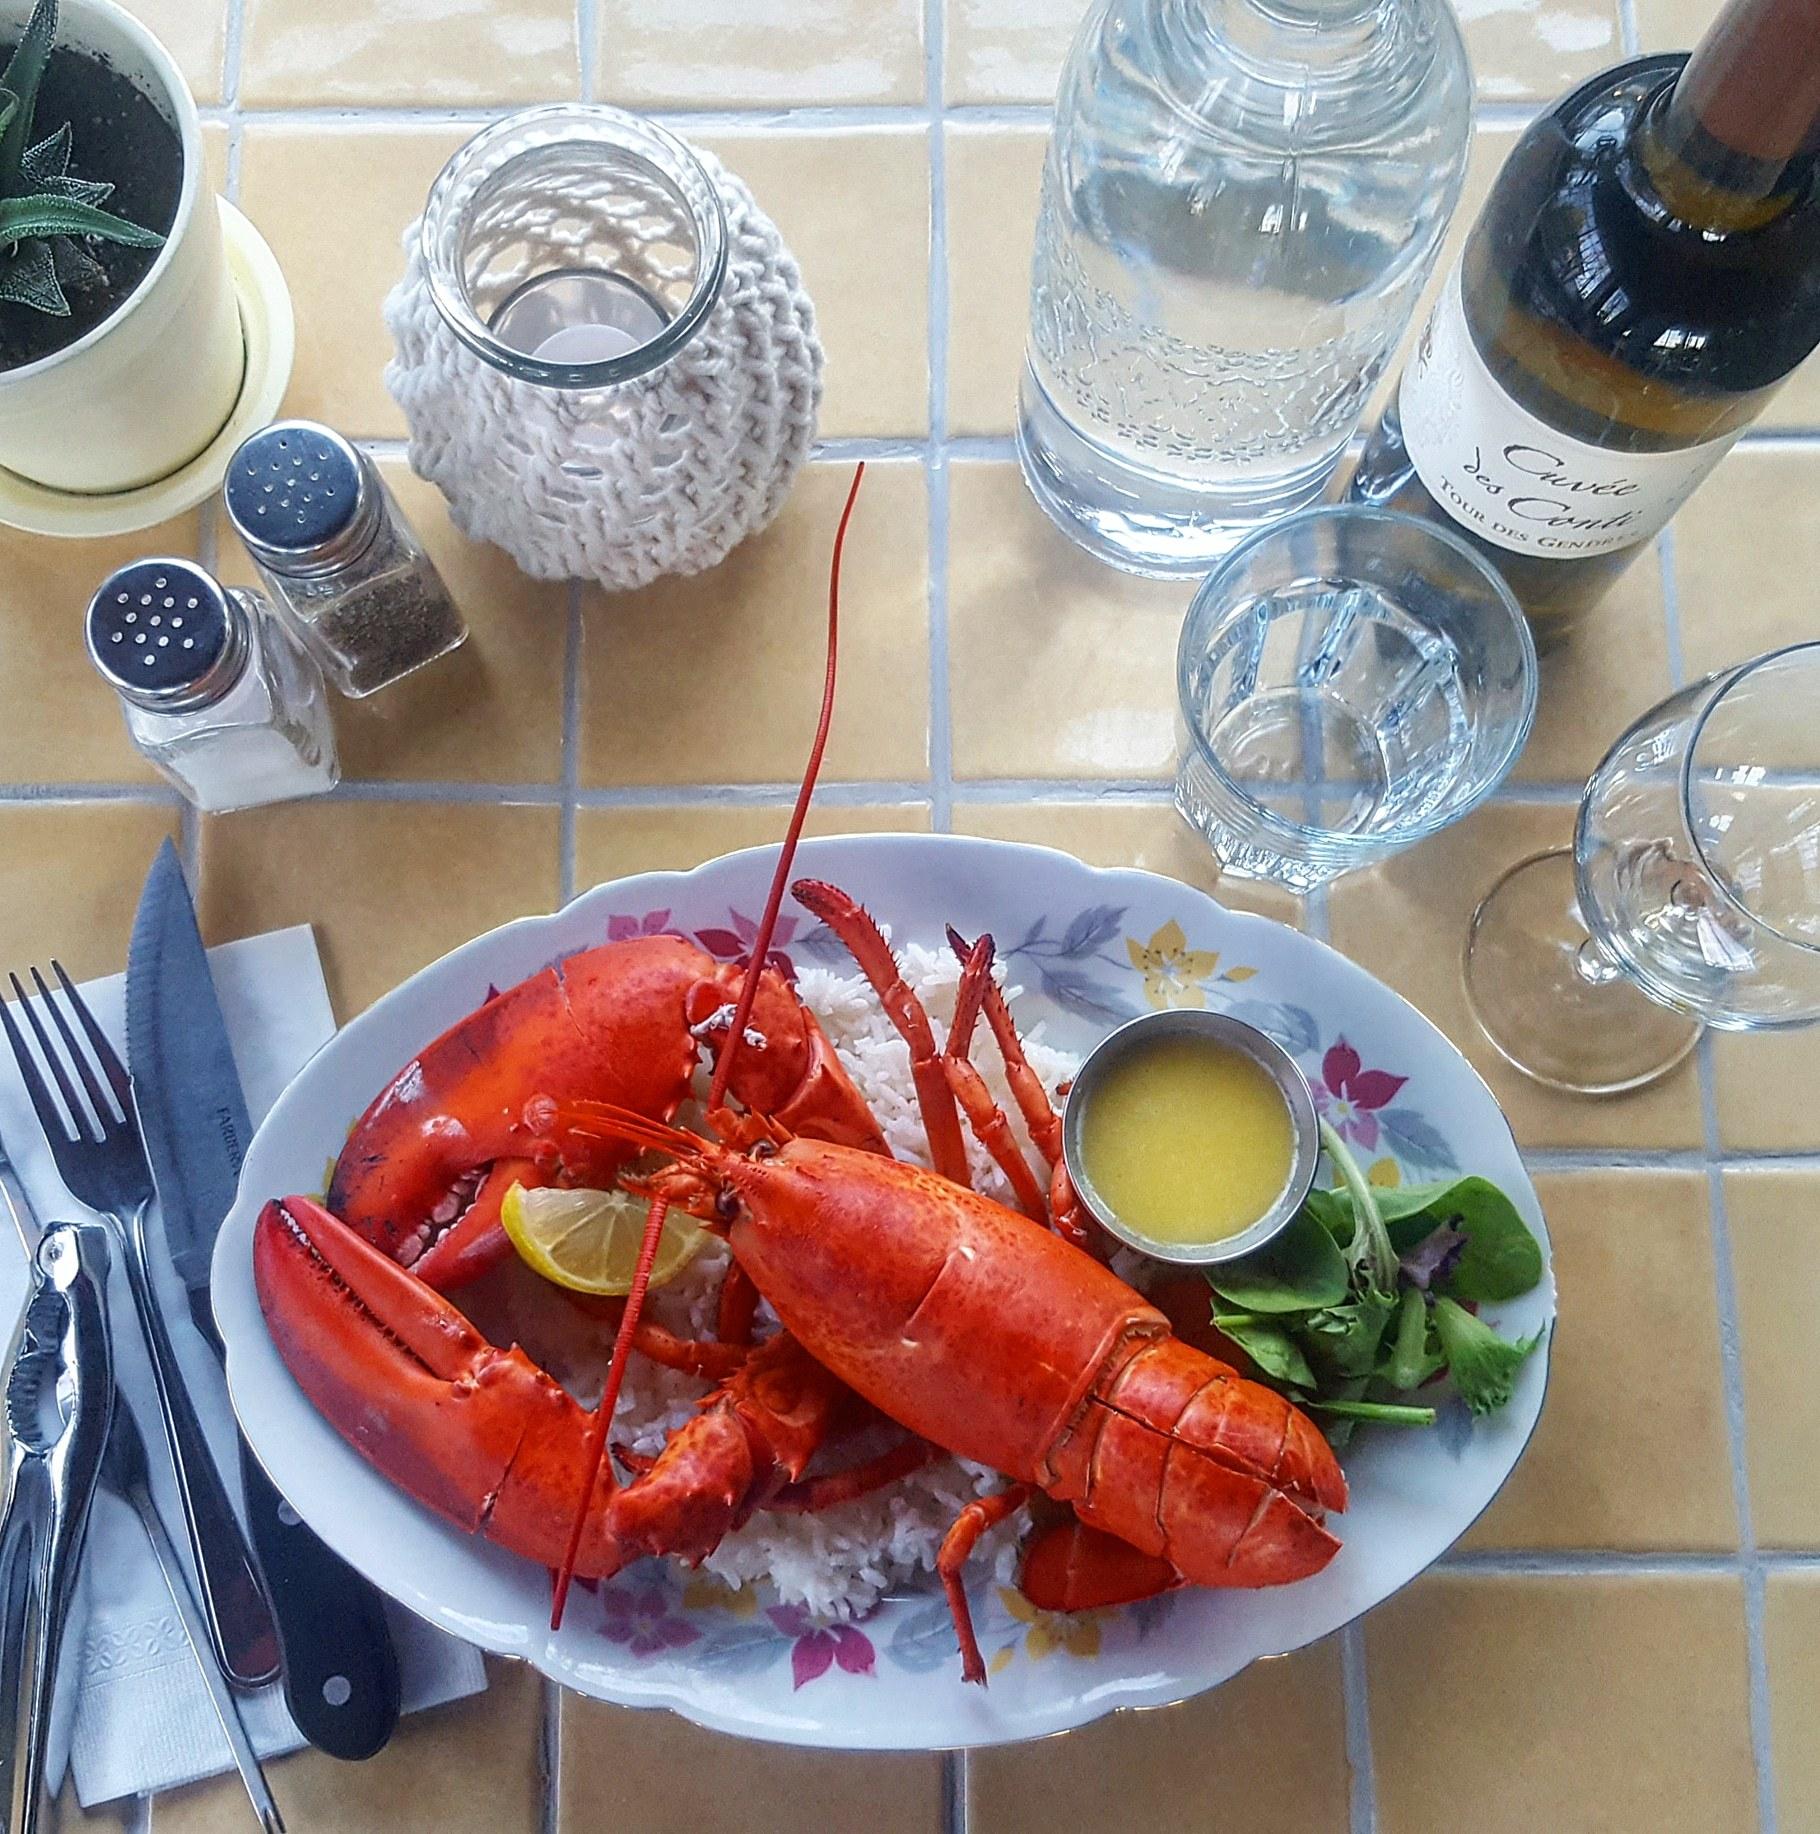 la-marlmite-restaurant-charlevoix-auberge-cote